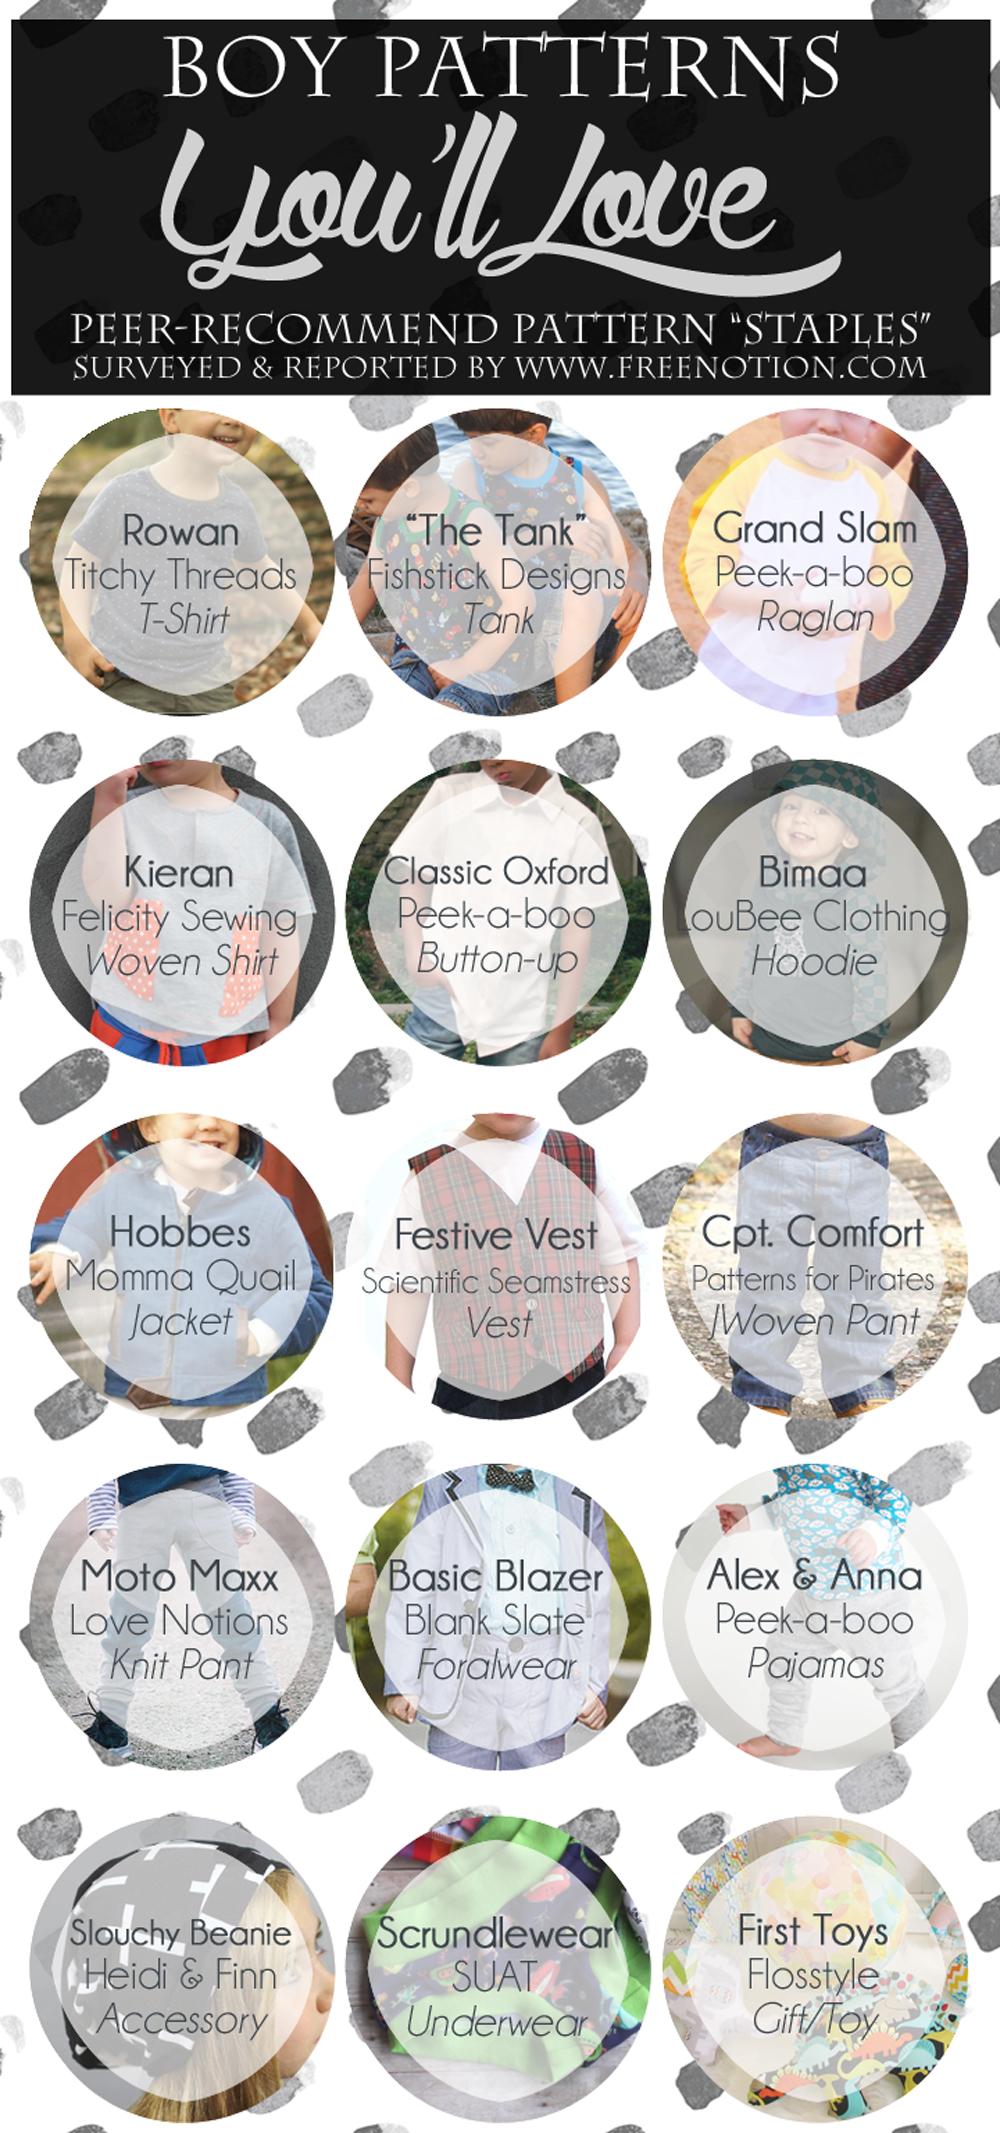 Rowan T-shirt / The Tank / Grand Slam Raglan / Kieran / Classic Oxford / Bimaa / H  obbes Hooded Jacket / Festive Vest /  Cpt. Comfort  /  Moto Maxx  /  Basic Blazer  /  Alex & Anna  /  Slouchy Beanie  /  Scrundlewear  /  First Toys